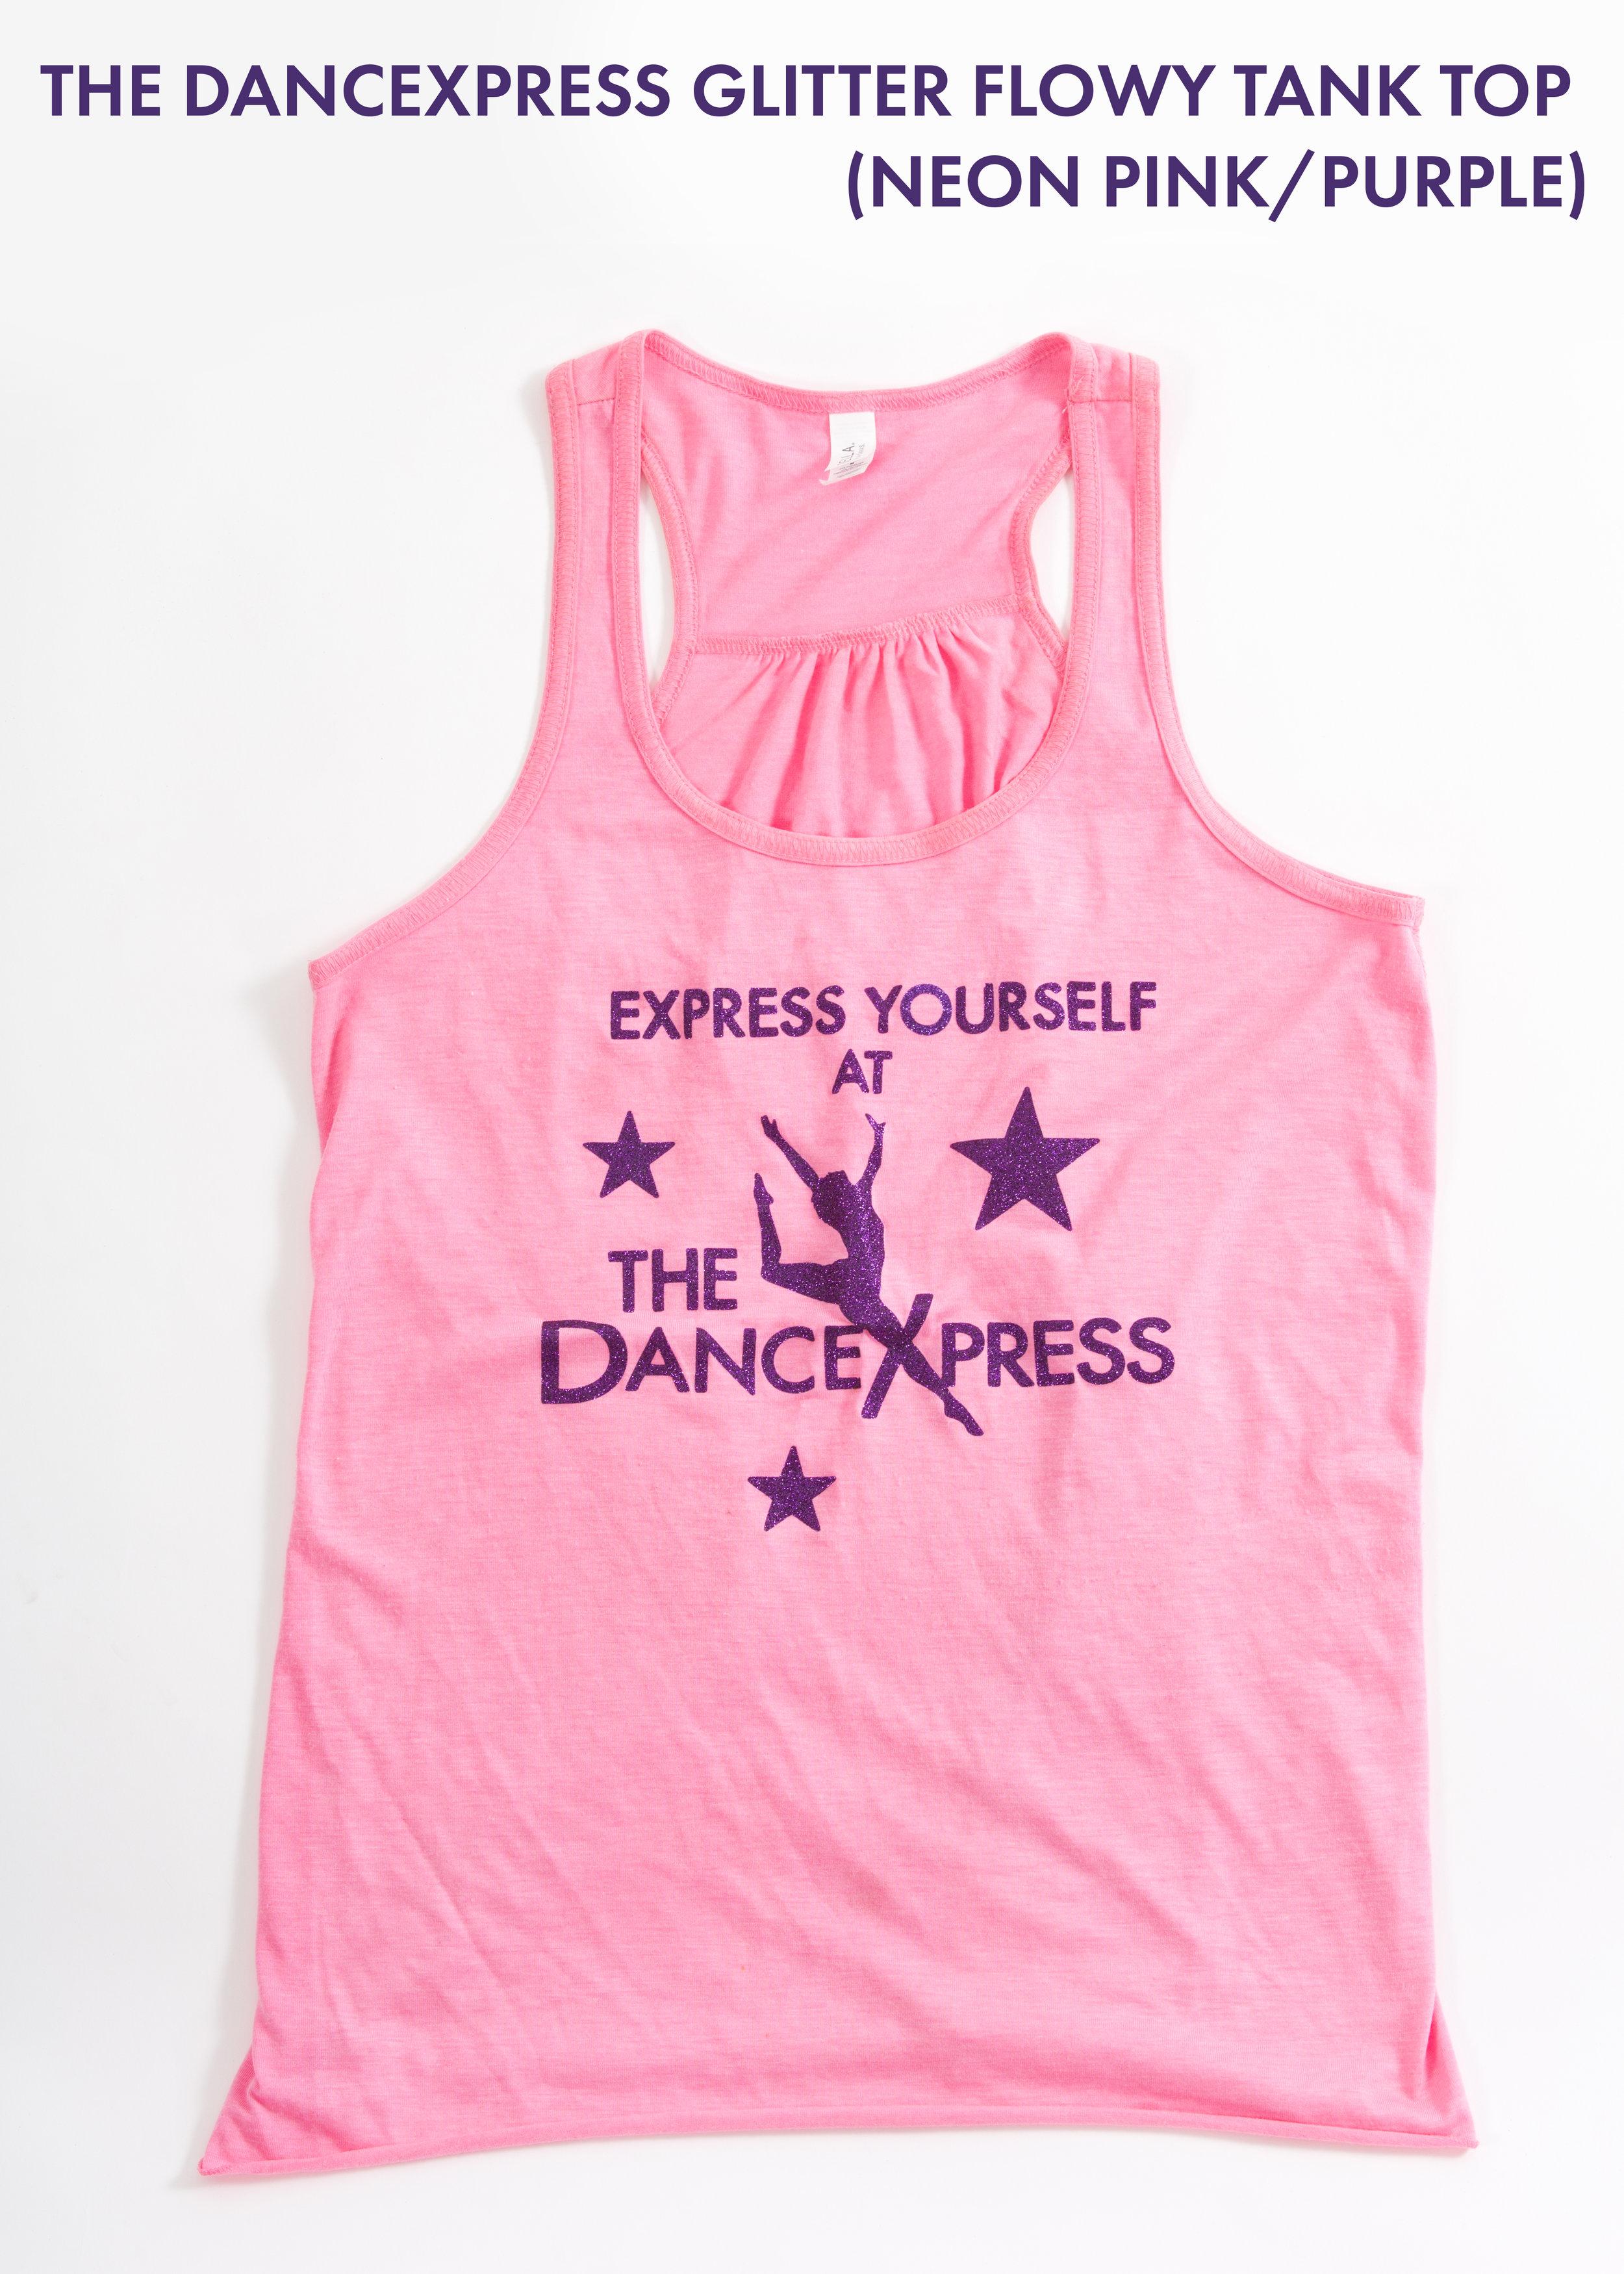 DanceXpressApparel-FLOWY TANK PINK 2.jpg